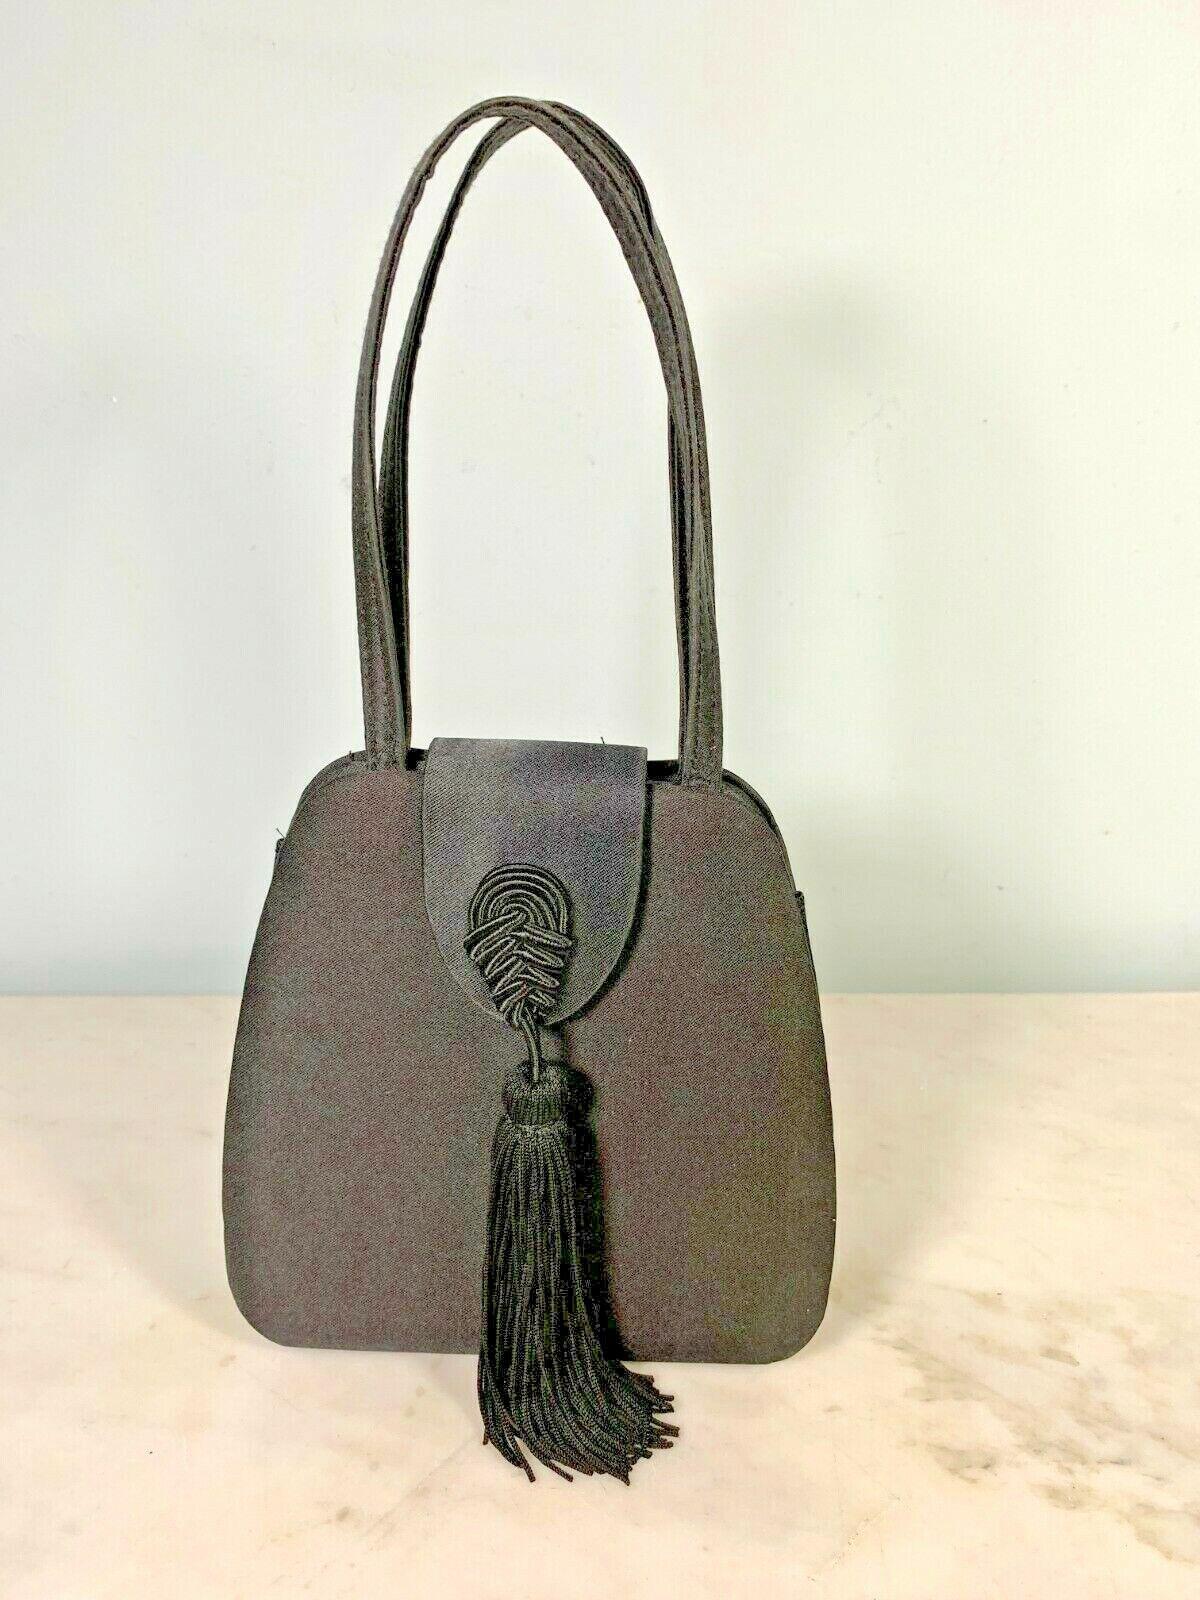 Vintage black satin double top handled evening purse large front tassel ornament